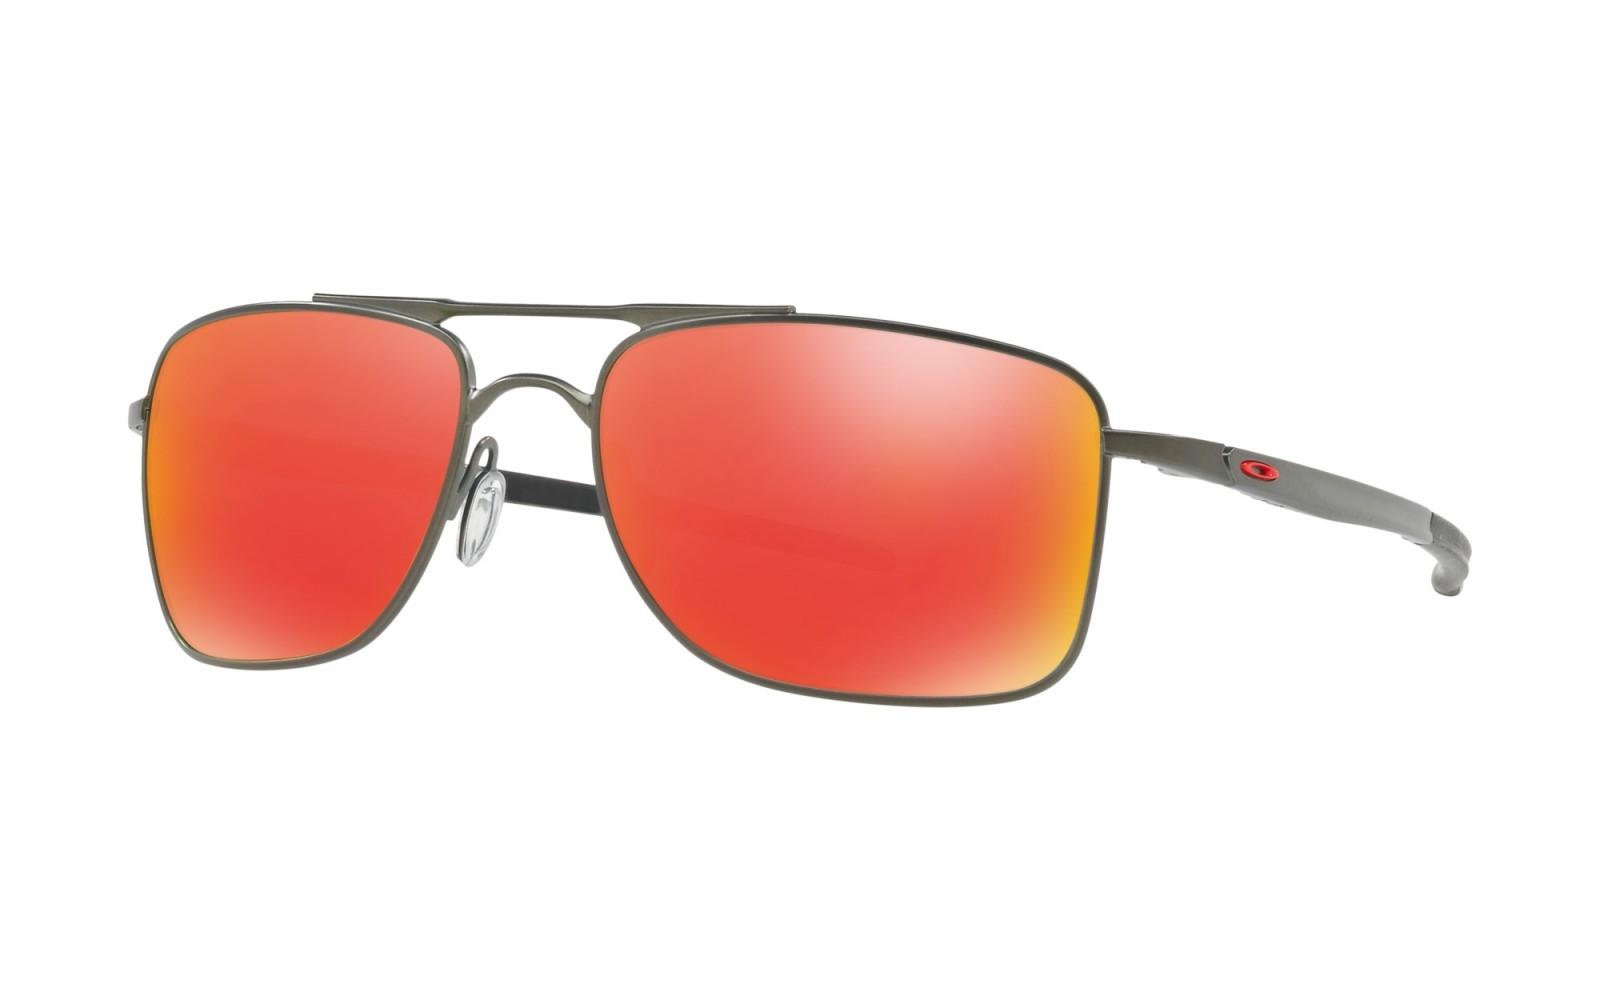 Oakley Gauge 8 M - Matte Carbon / Ruby Iridium - OO4124-0357 Zonnebril